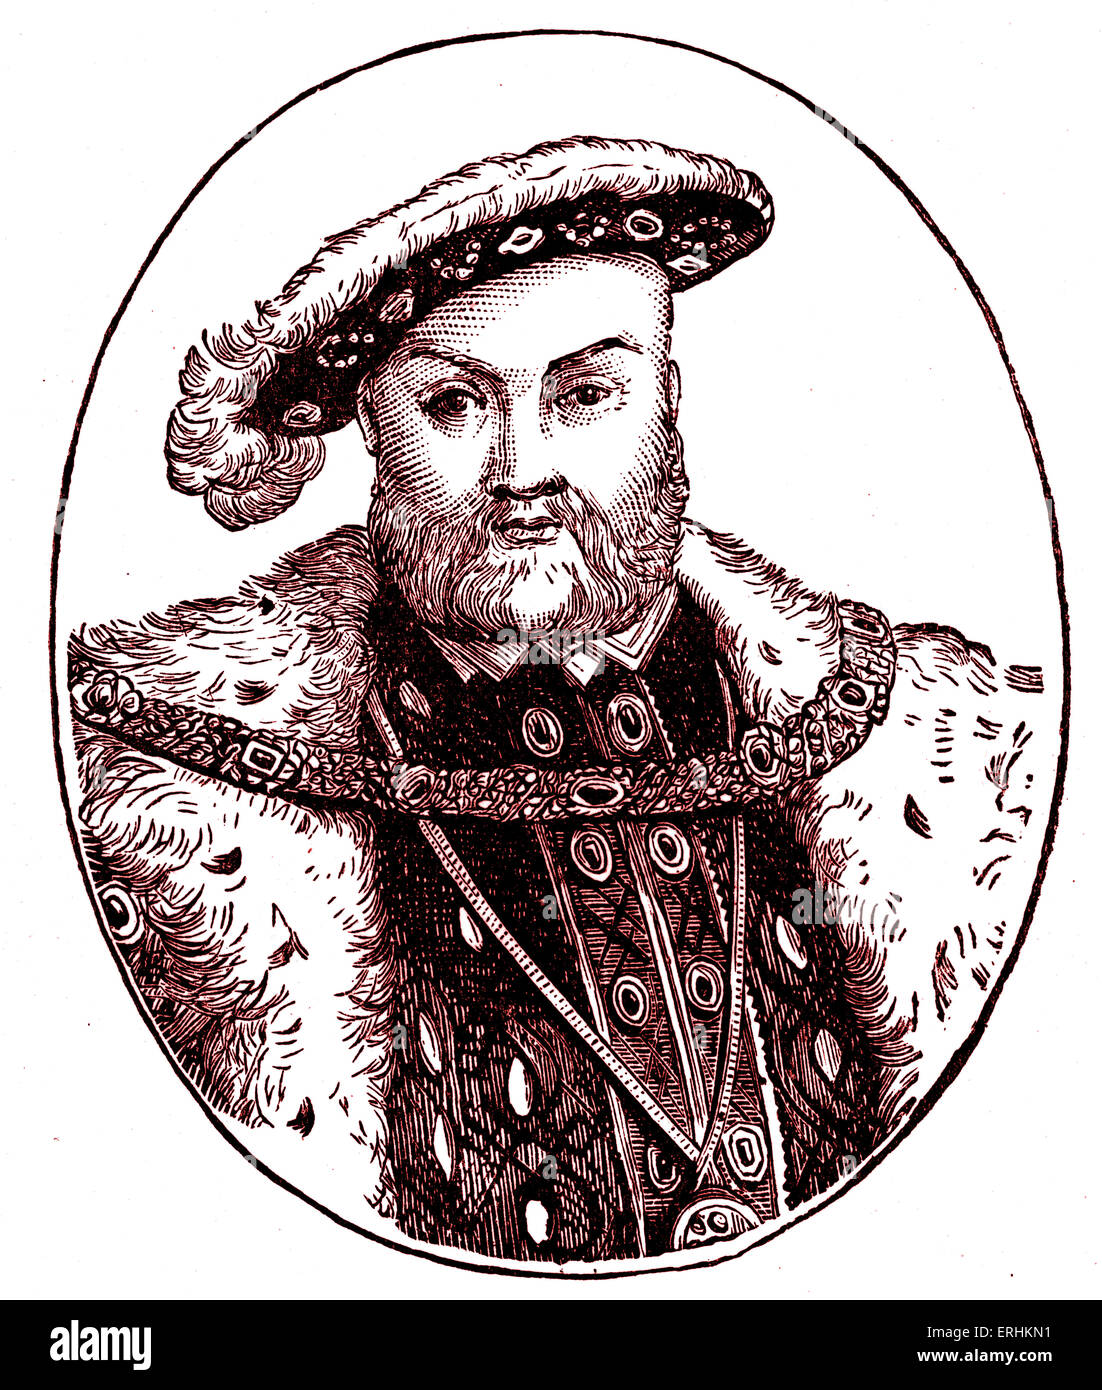 Henry VIII. King of England. 28 June 1491 – 28 January 1547. - Stock Image